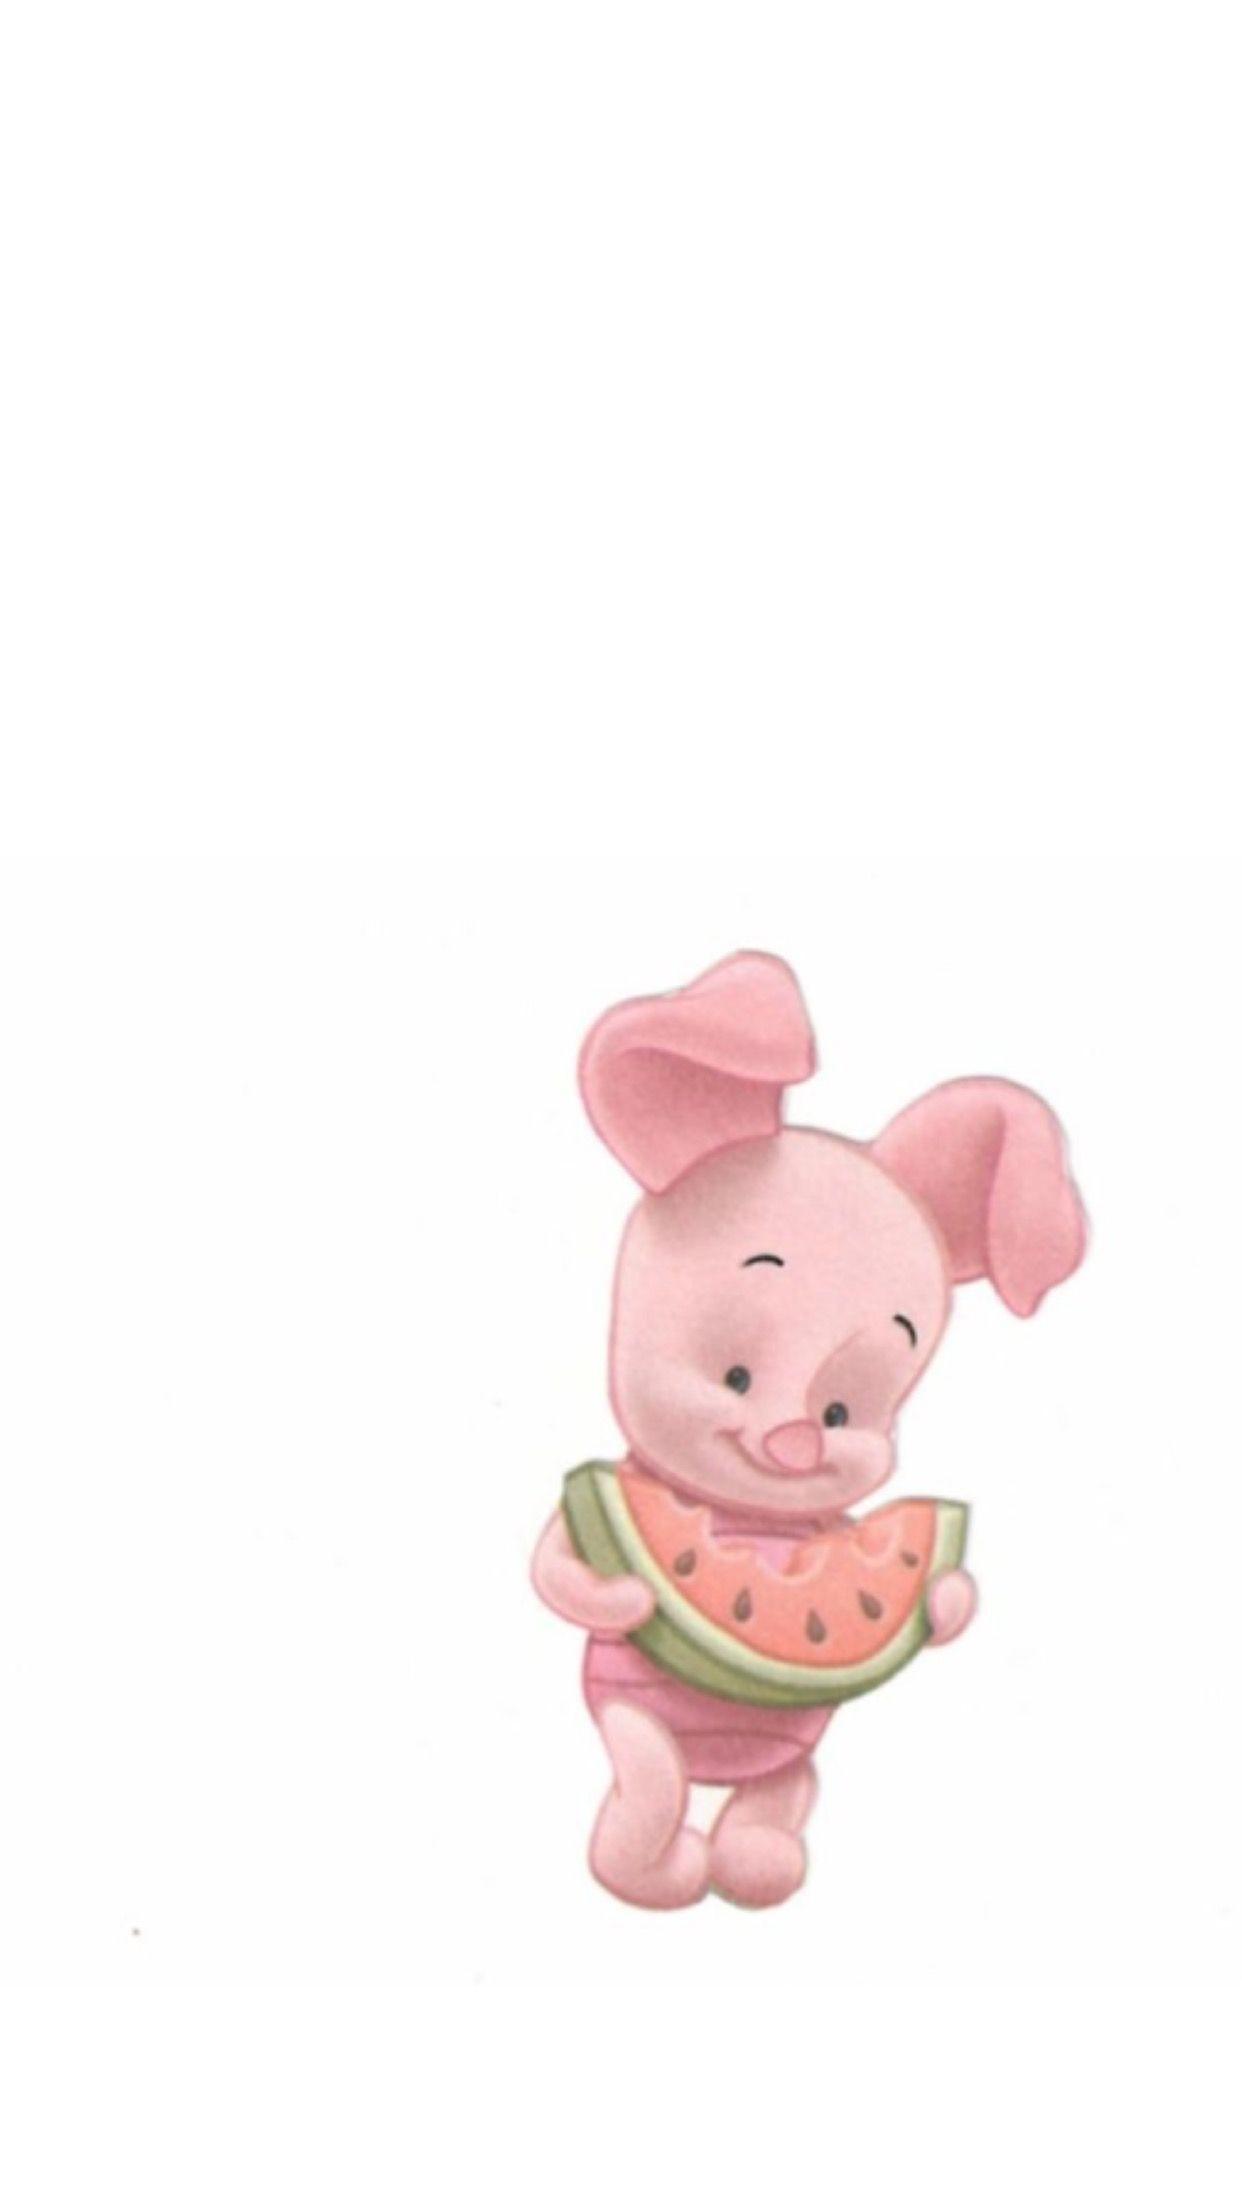 Wallpaper Iphone Disney Cute Wallpaper For Phone Cute Baby Piglet Winnie The Pooh 1242x2208 Wallpaper Teahub Io